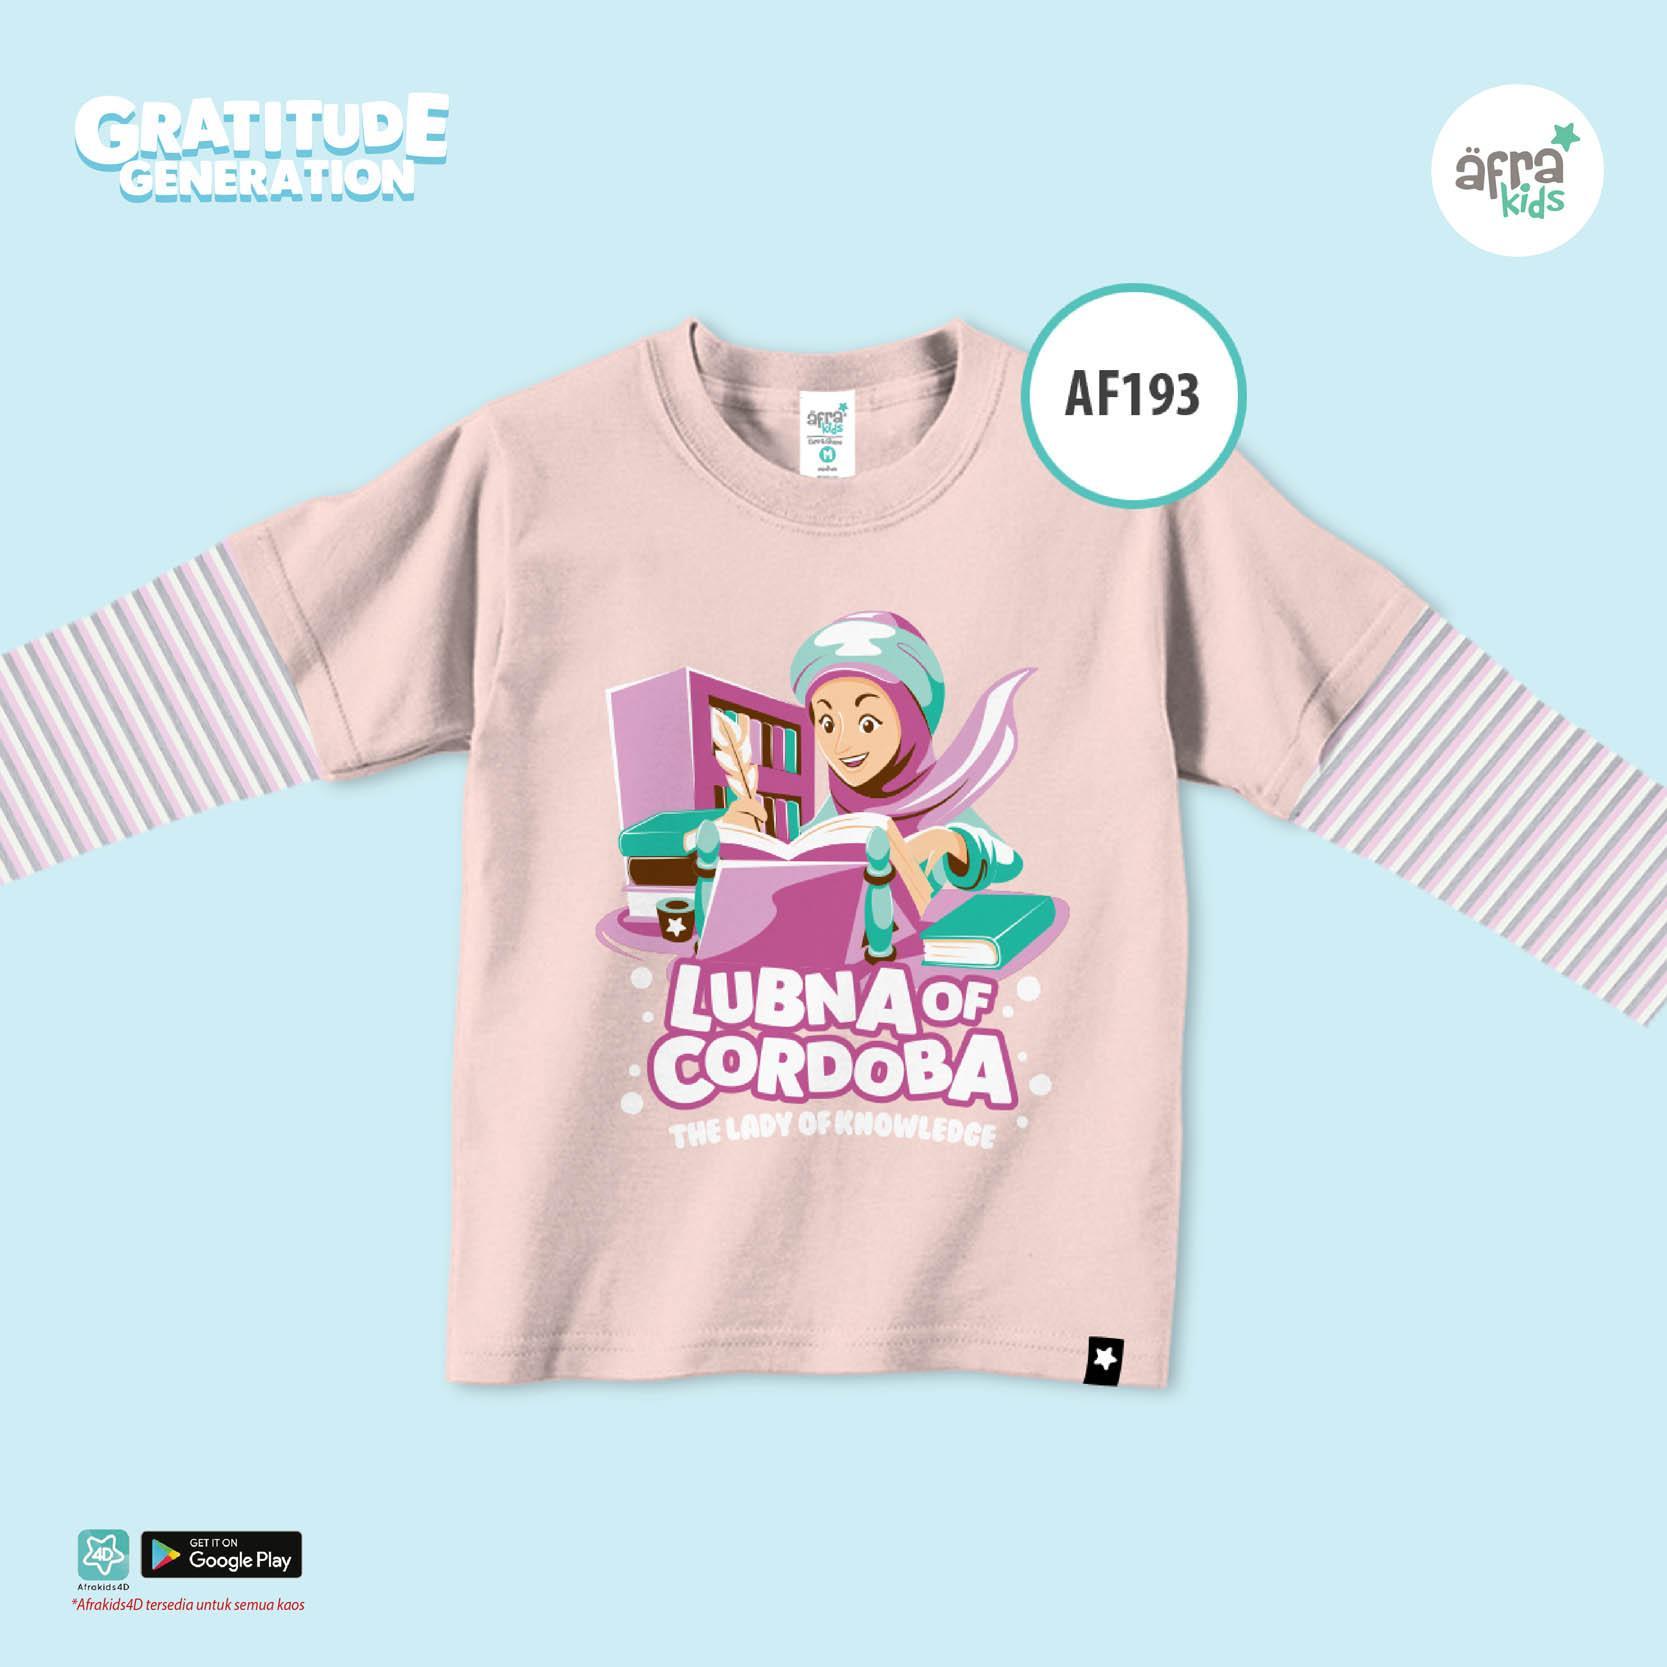 Aria Baju Kaos Anak Afrakids Seri Ilmuwan / Baju Kaos Anak Cewek / Baju Kaos Lengan Panjang Cewe perempuan / AF193 - Coklat Muda